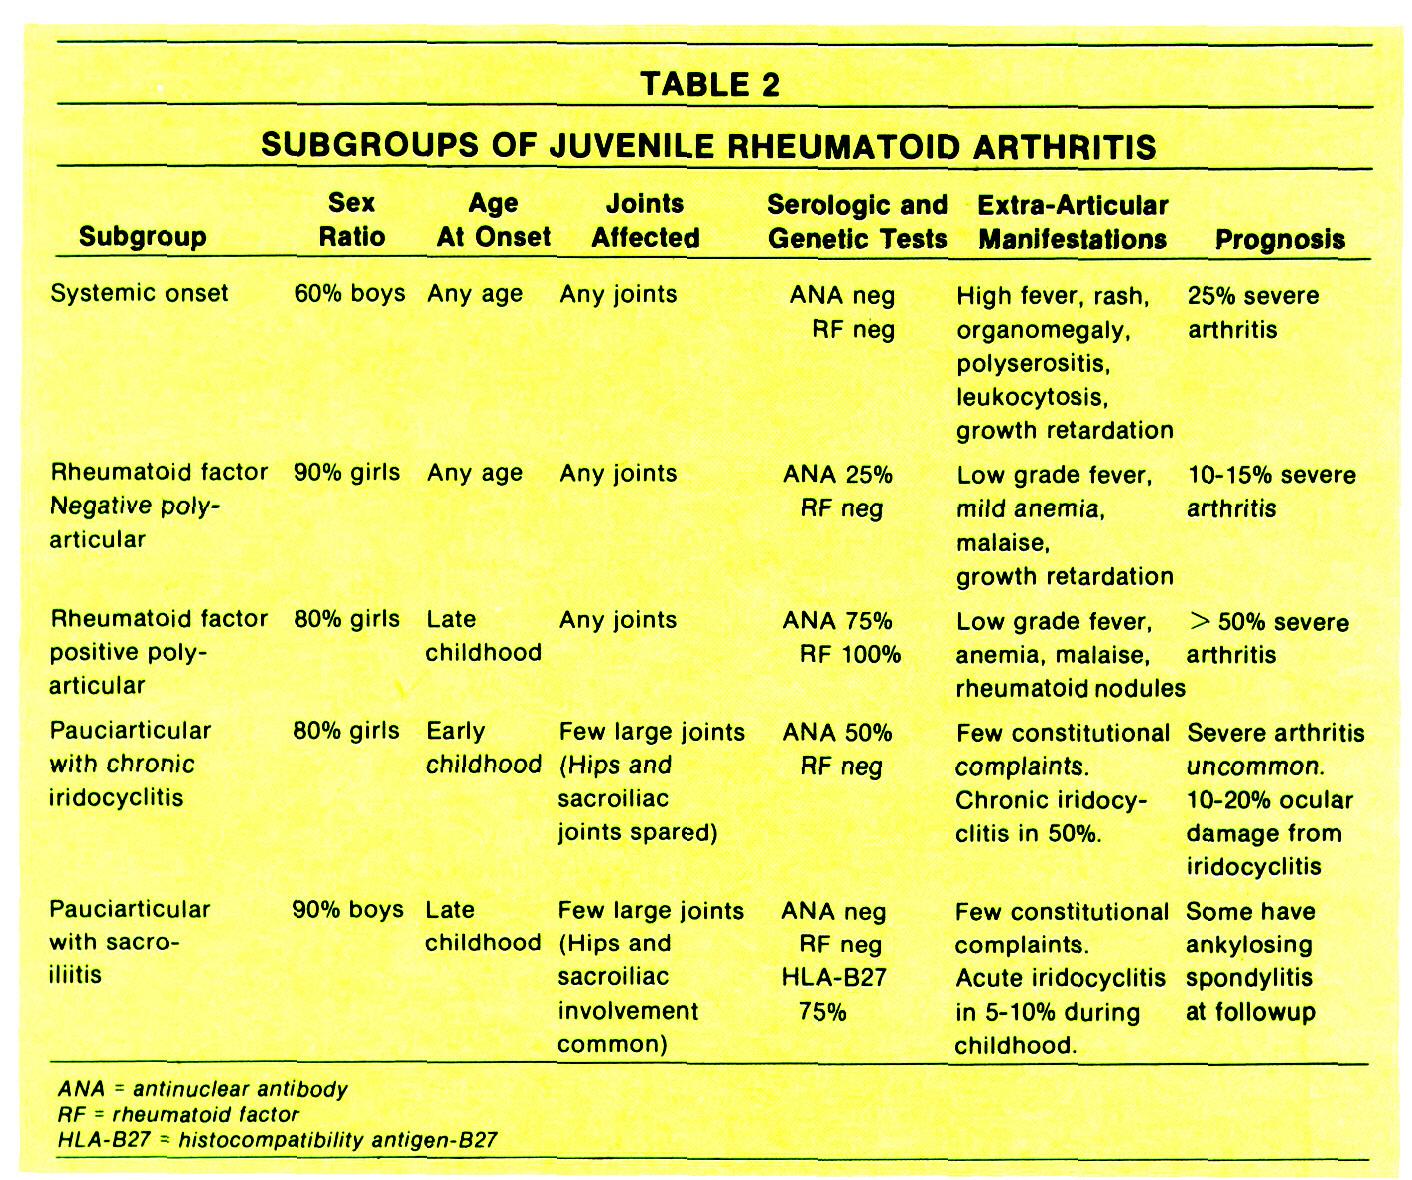 juvenile rheumatoid arthritis Juvenile rheumatoid arthritis is the most common form of arthritis affecting children.